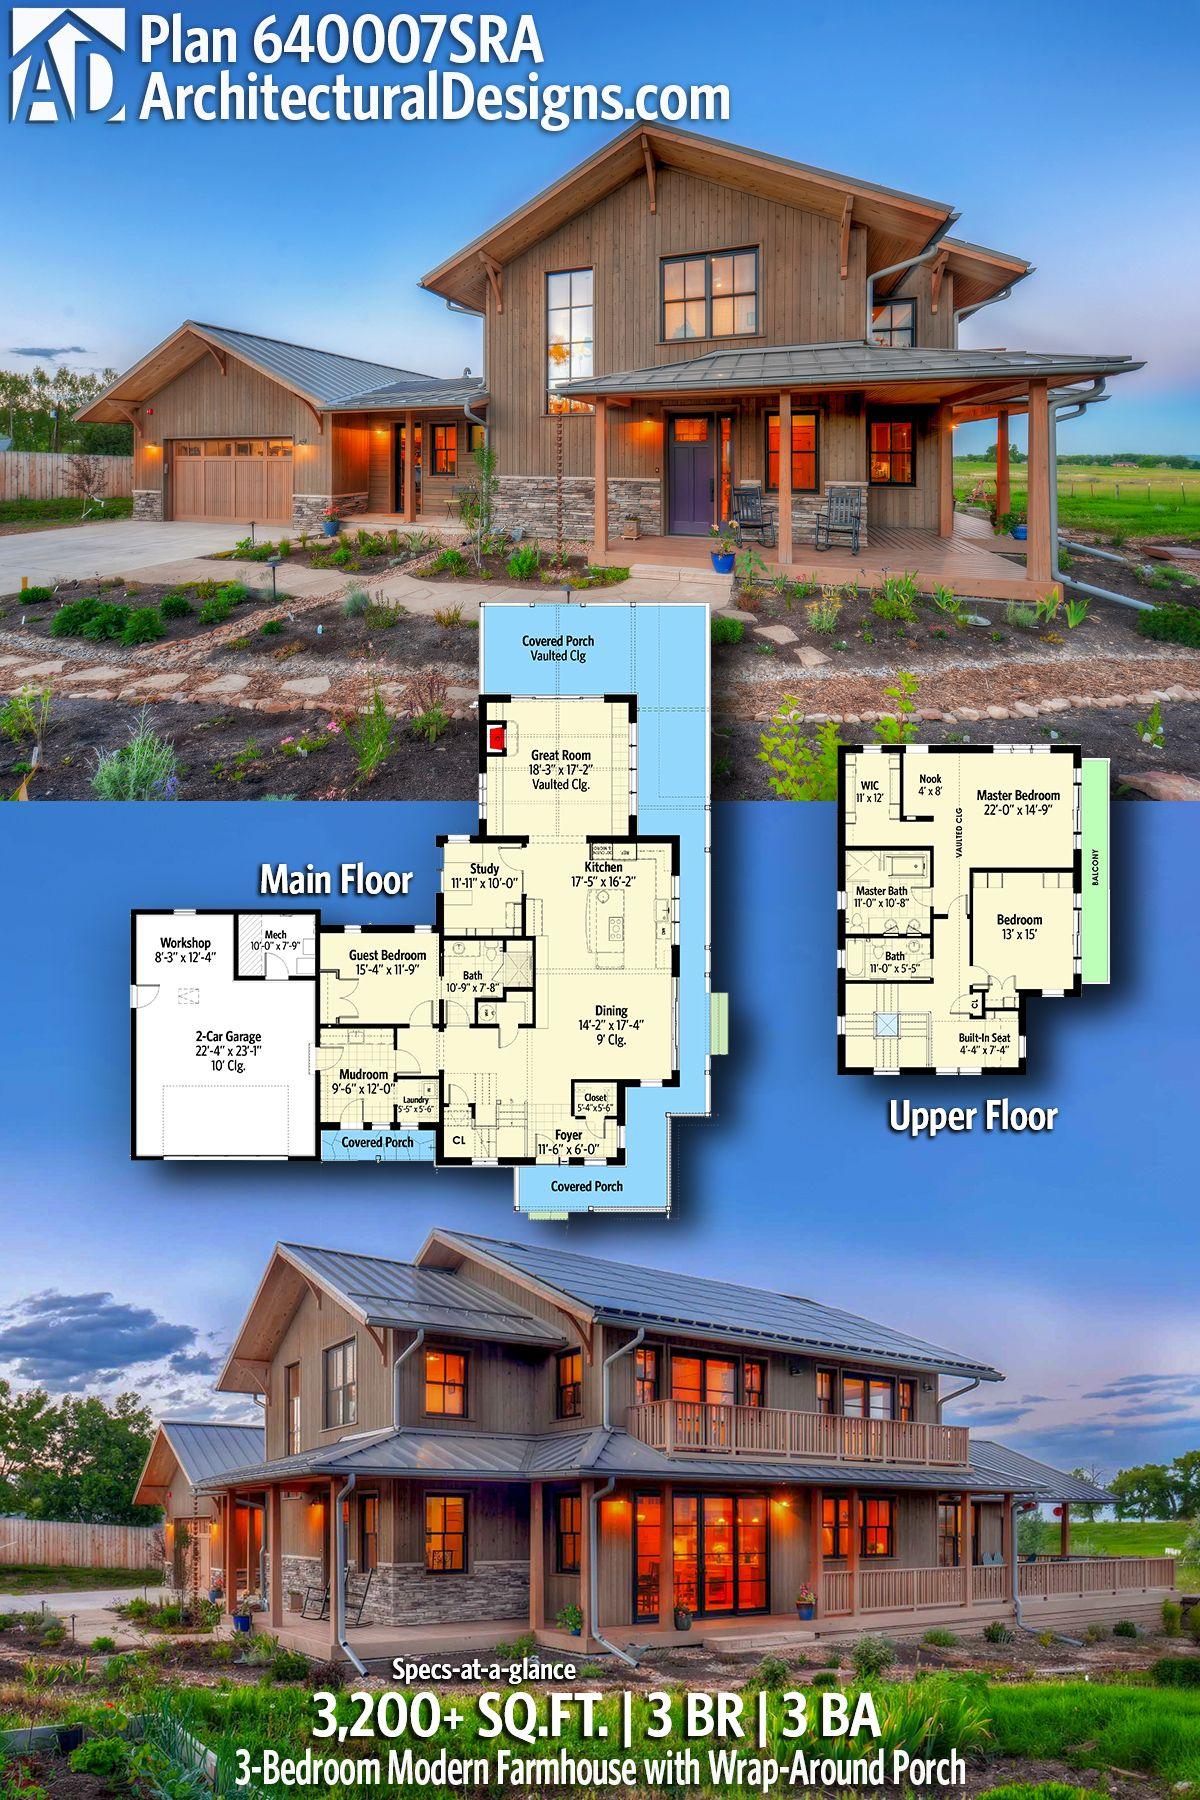 plan 640007sra modern craftsman farmhouse with wrap around porch